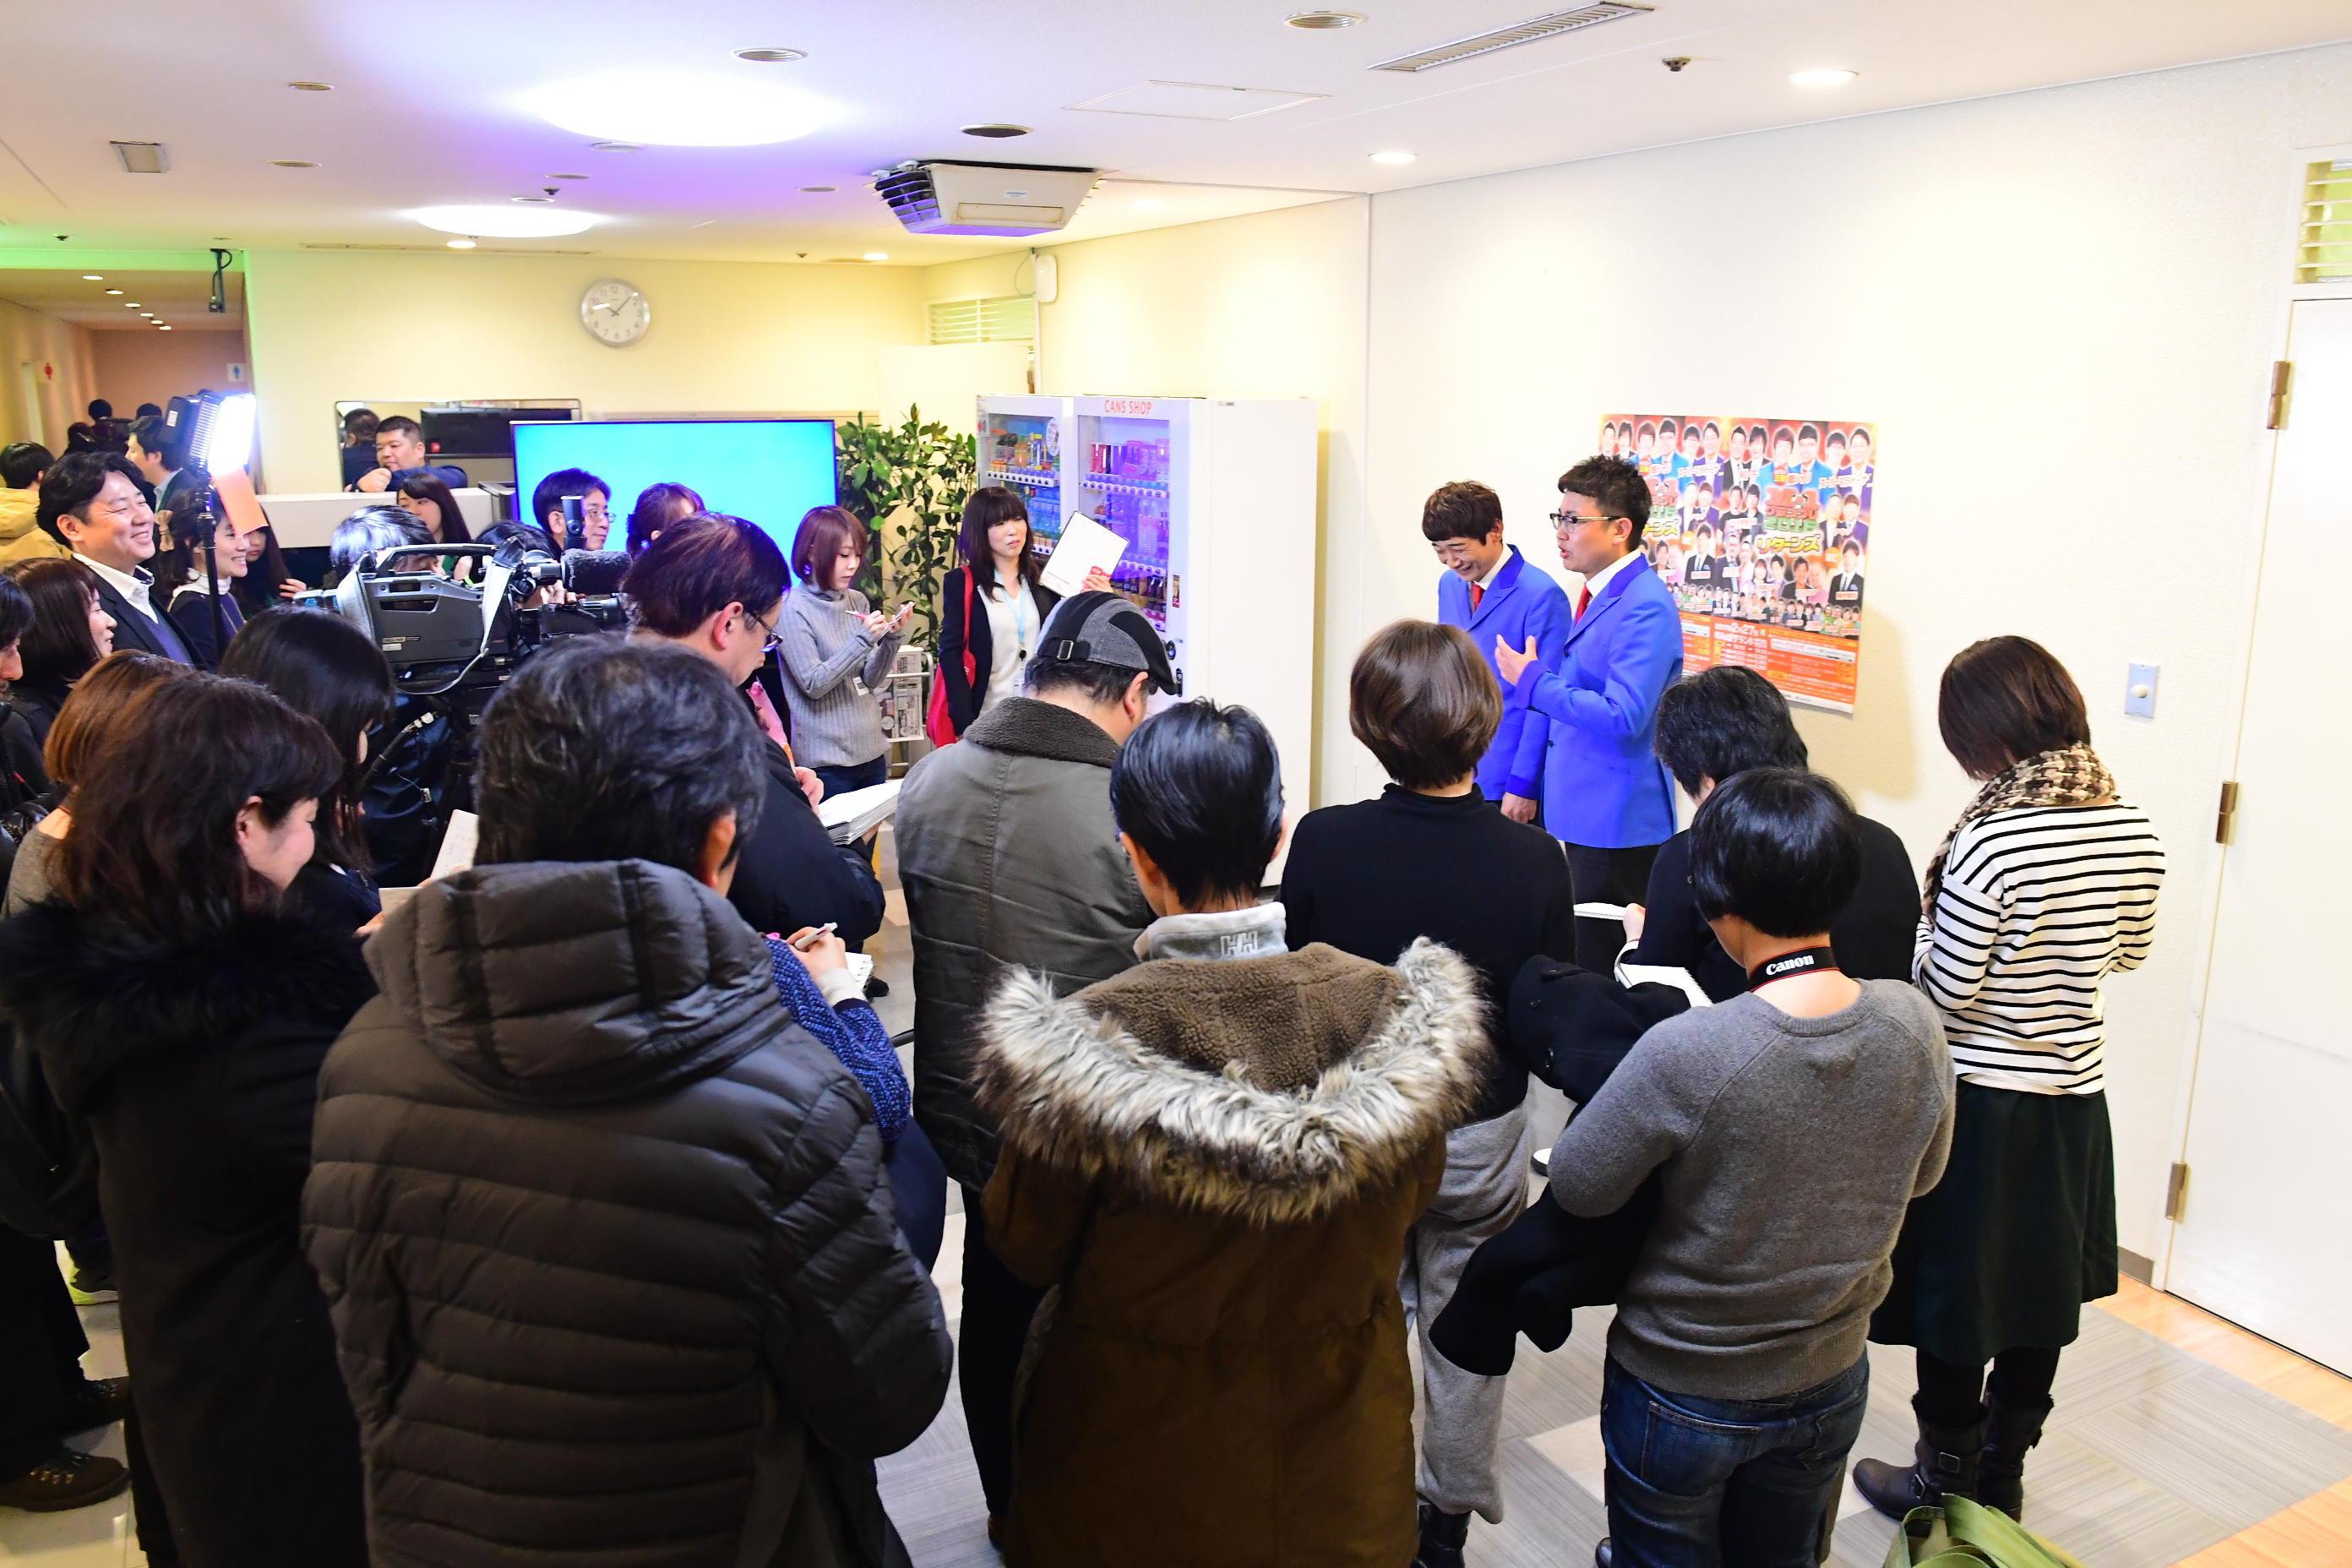 http://news.yoshimoto.co.jp/20170228160027-d646d5951361936ae4c0aa0084d4104422795e3b.jpg